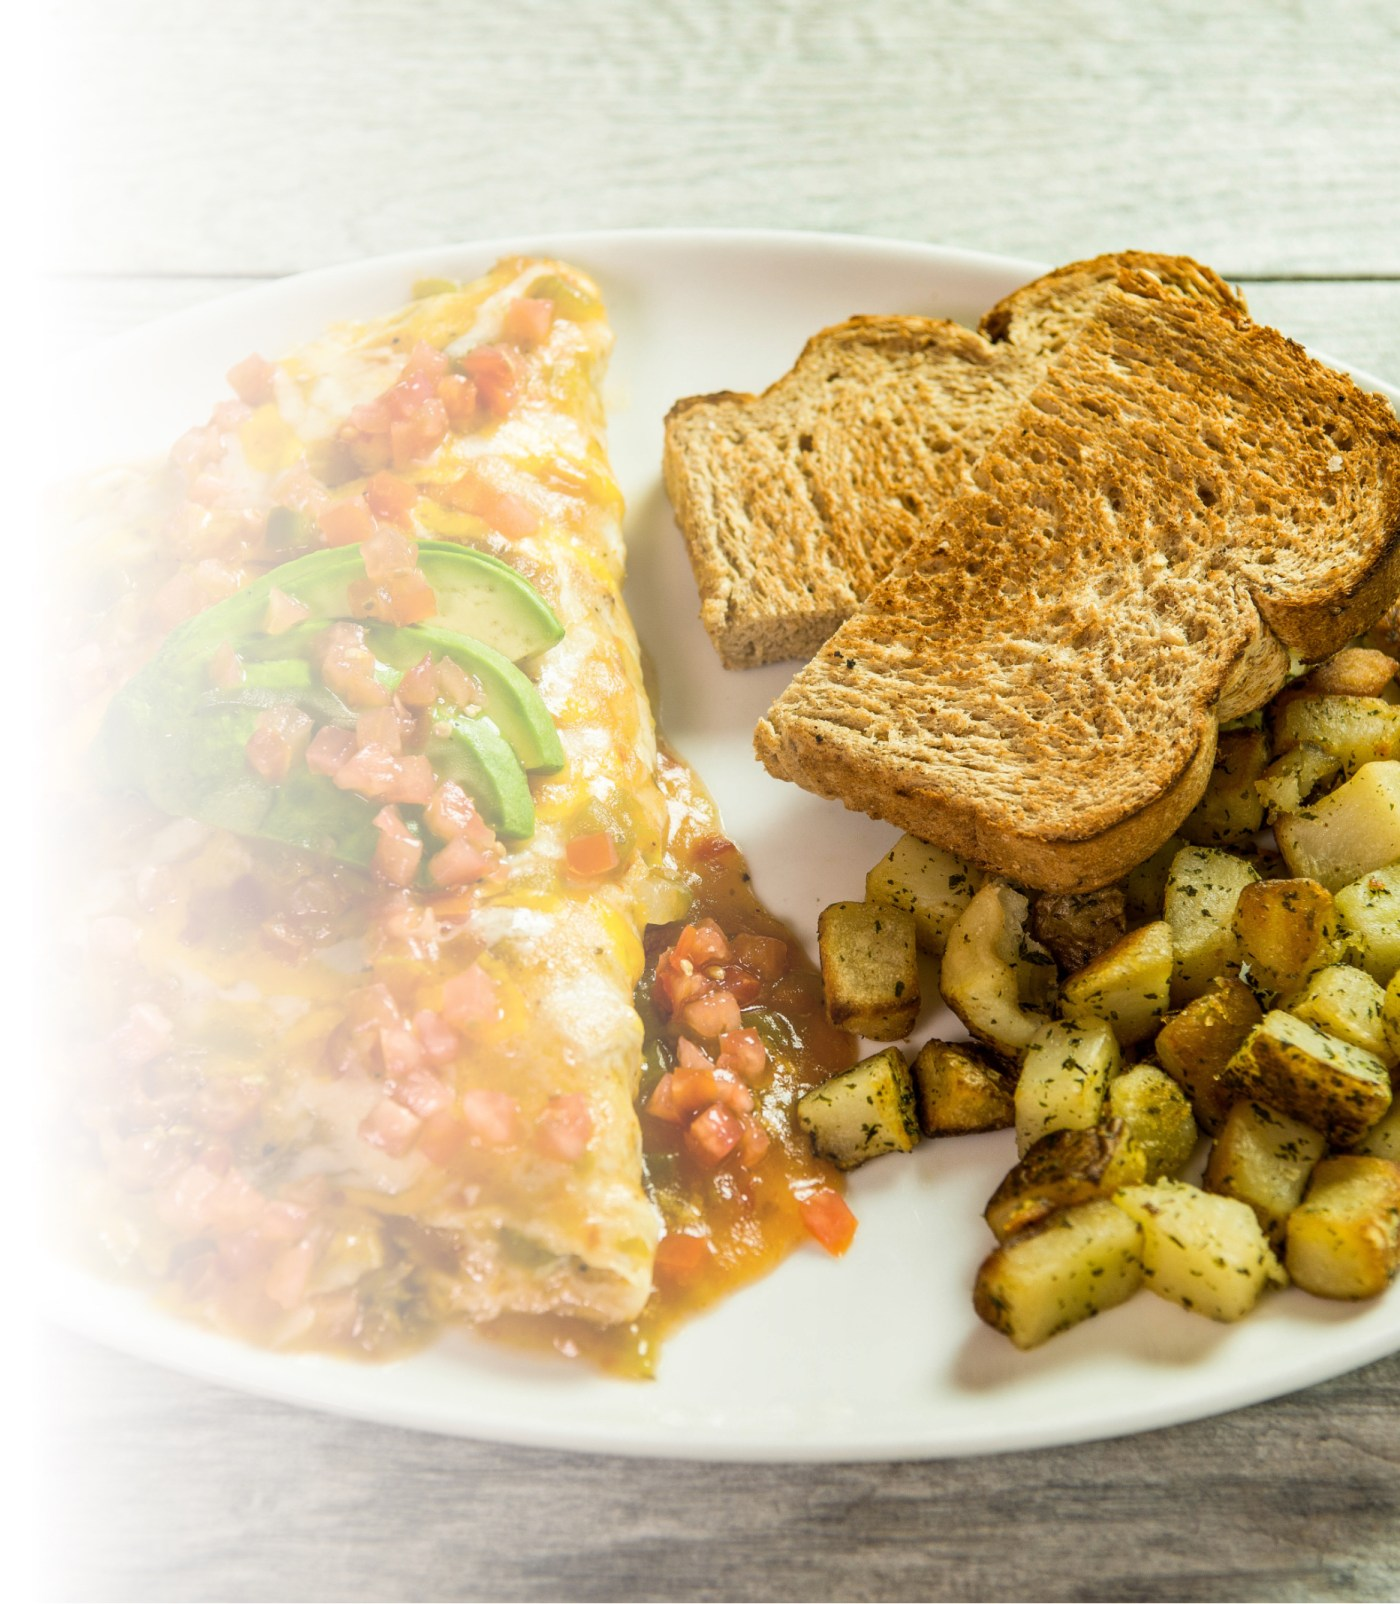 Breakfast eggs, toast and potatoes